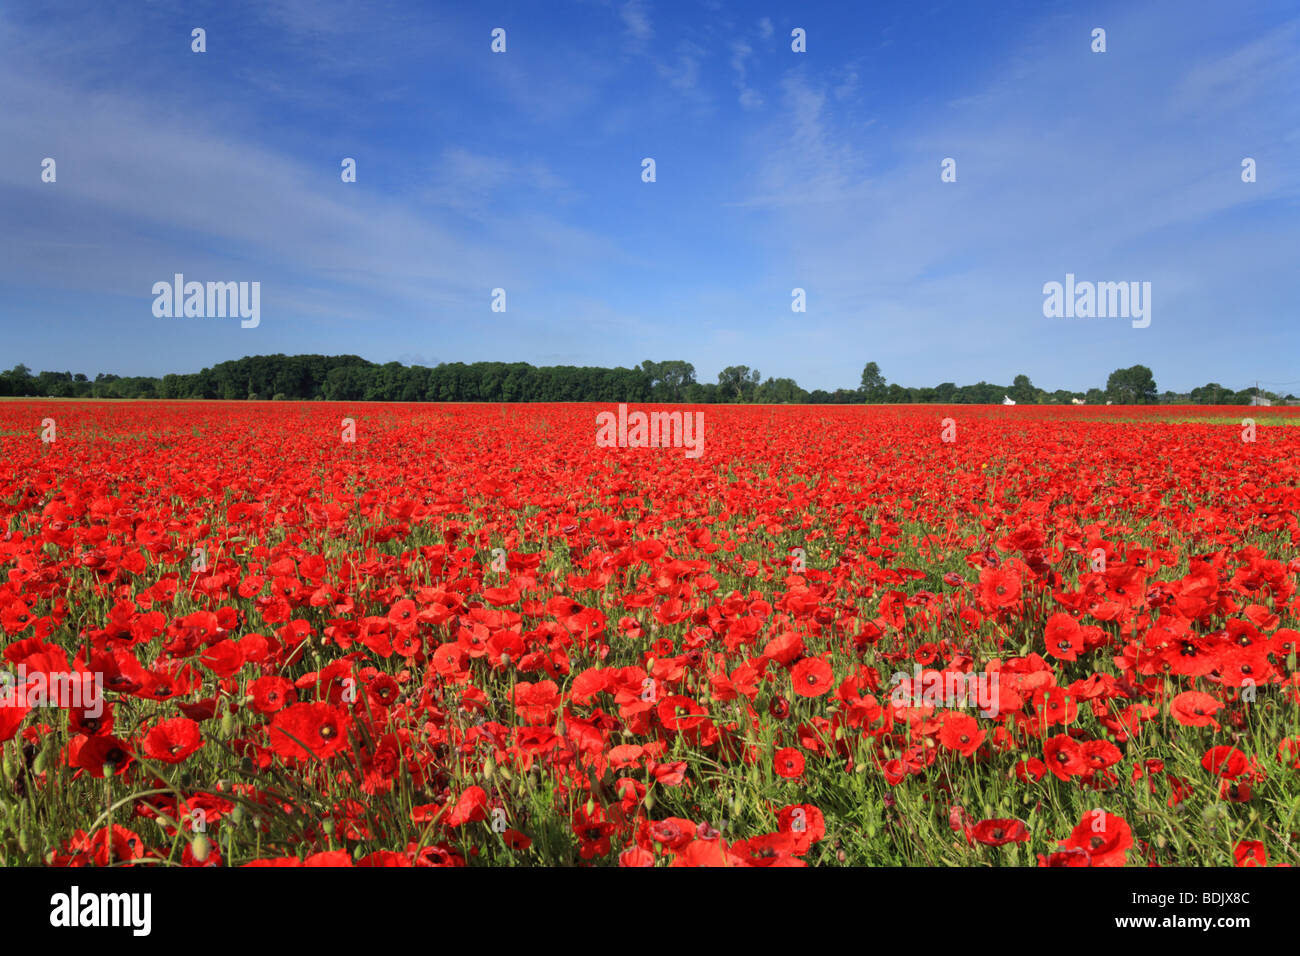 Field of poppies, 'Foxton' Cambridge, Cambridgeshire, England, UK - Stock Image